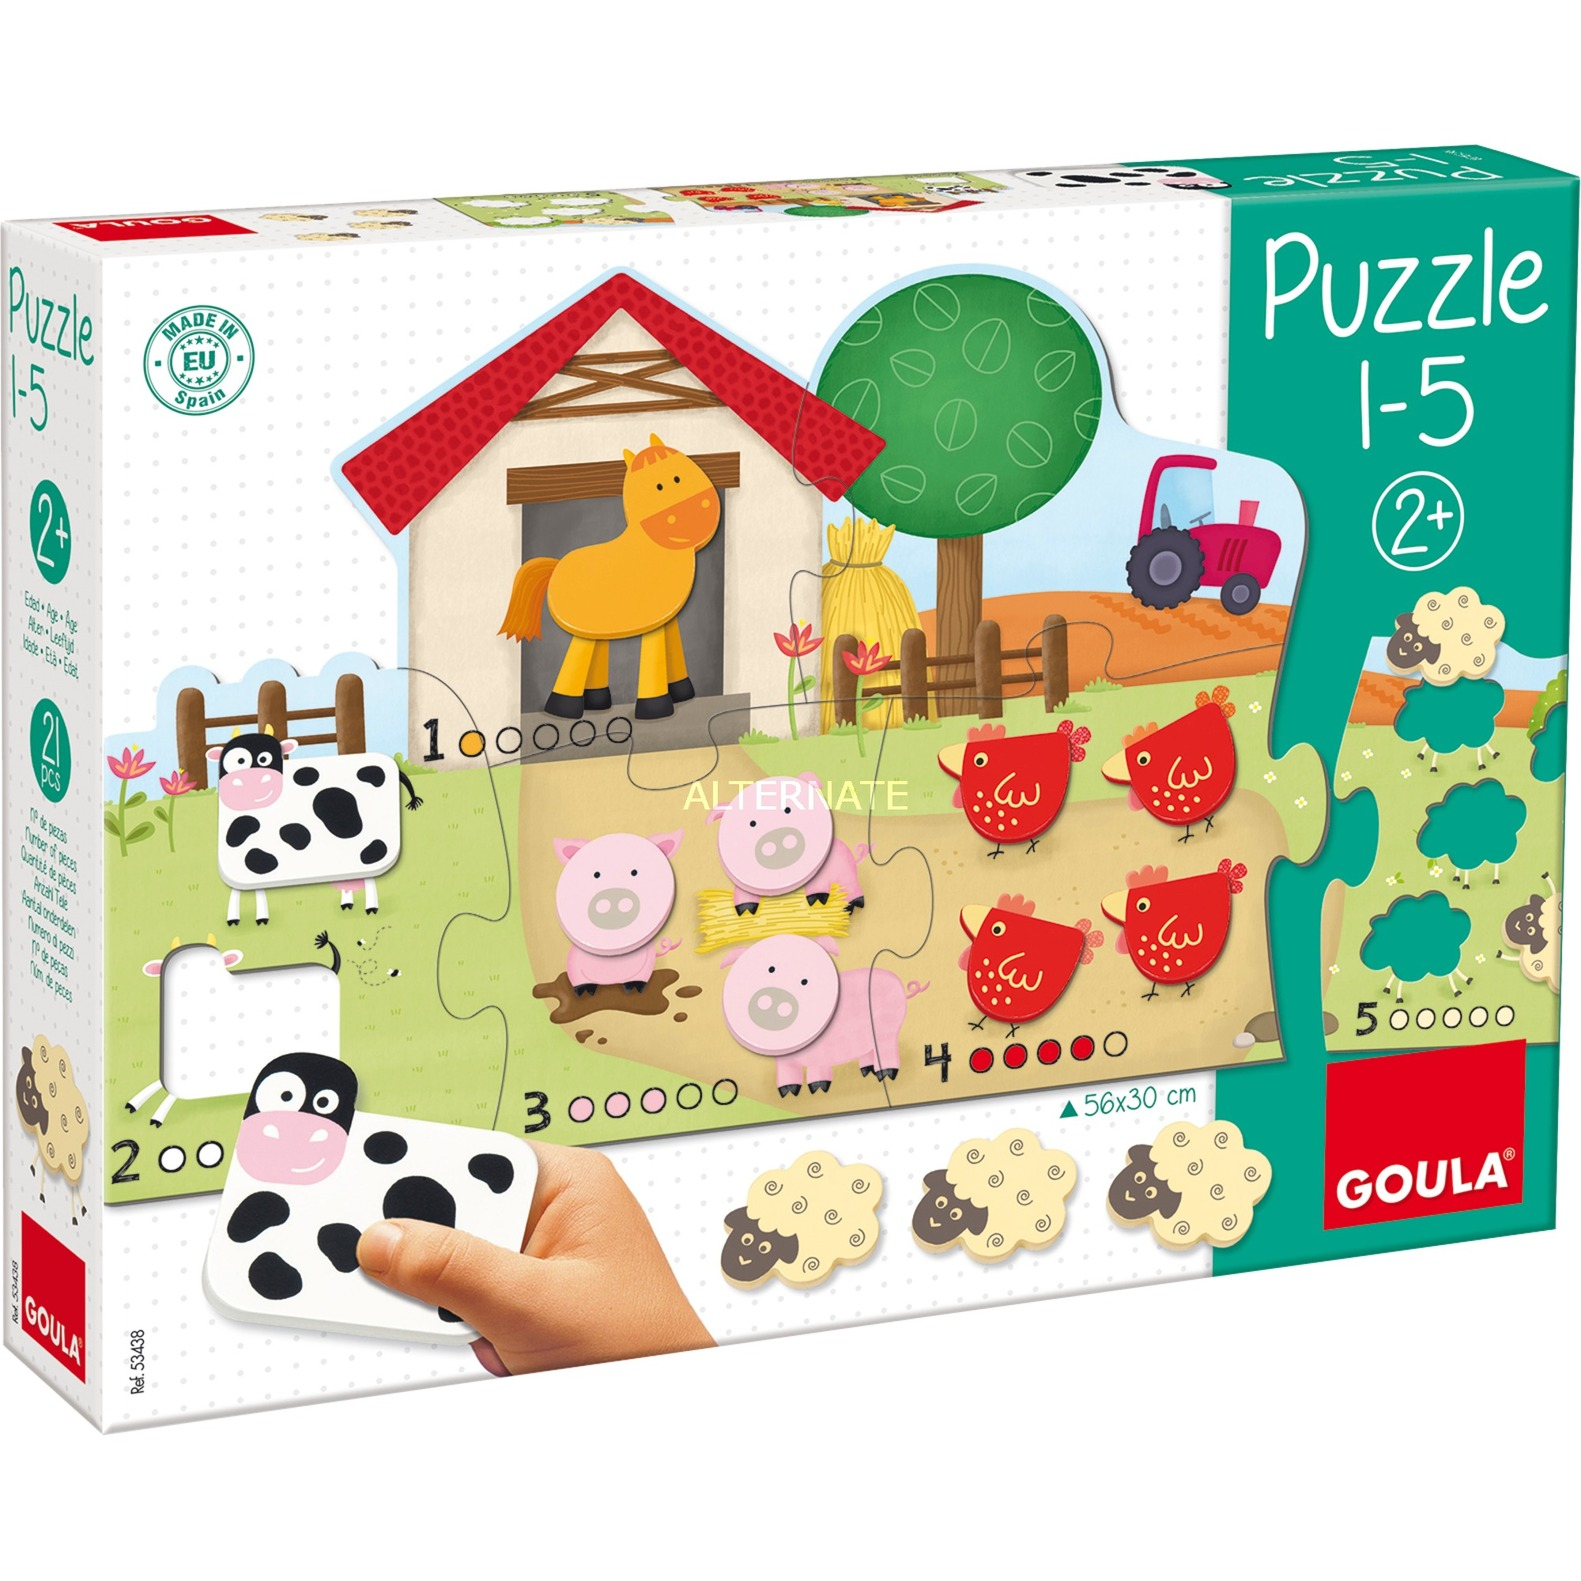 1-5 Puzzle Rompecabezas